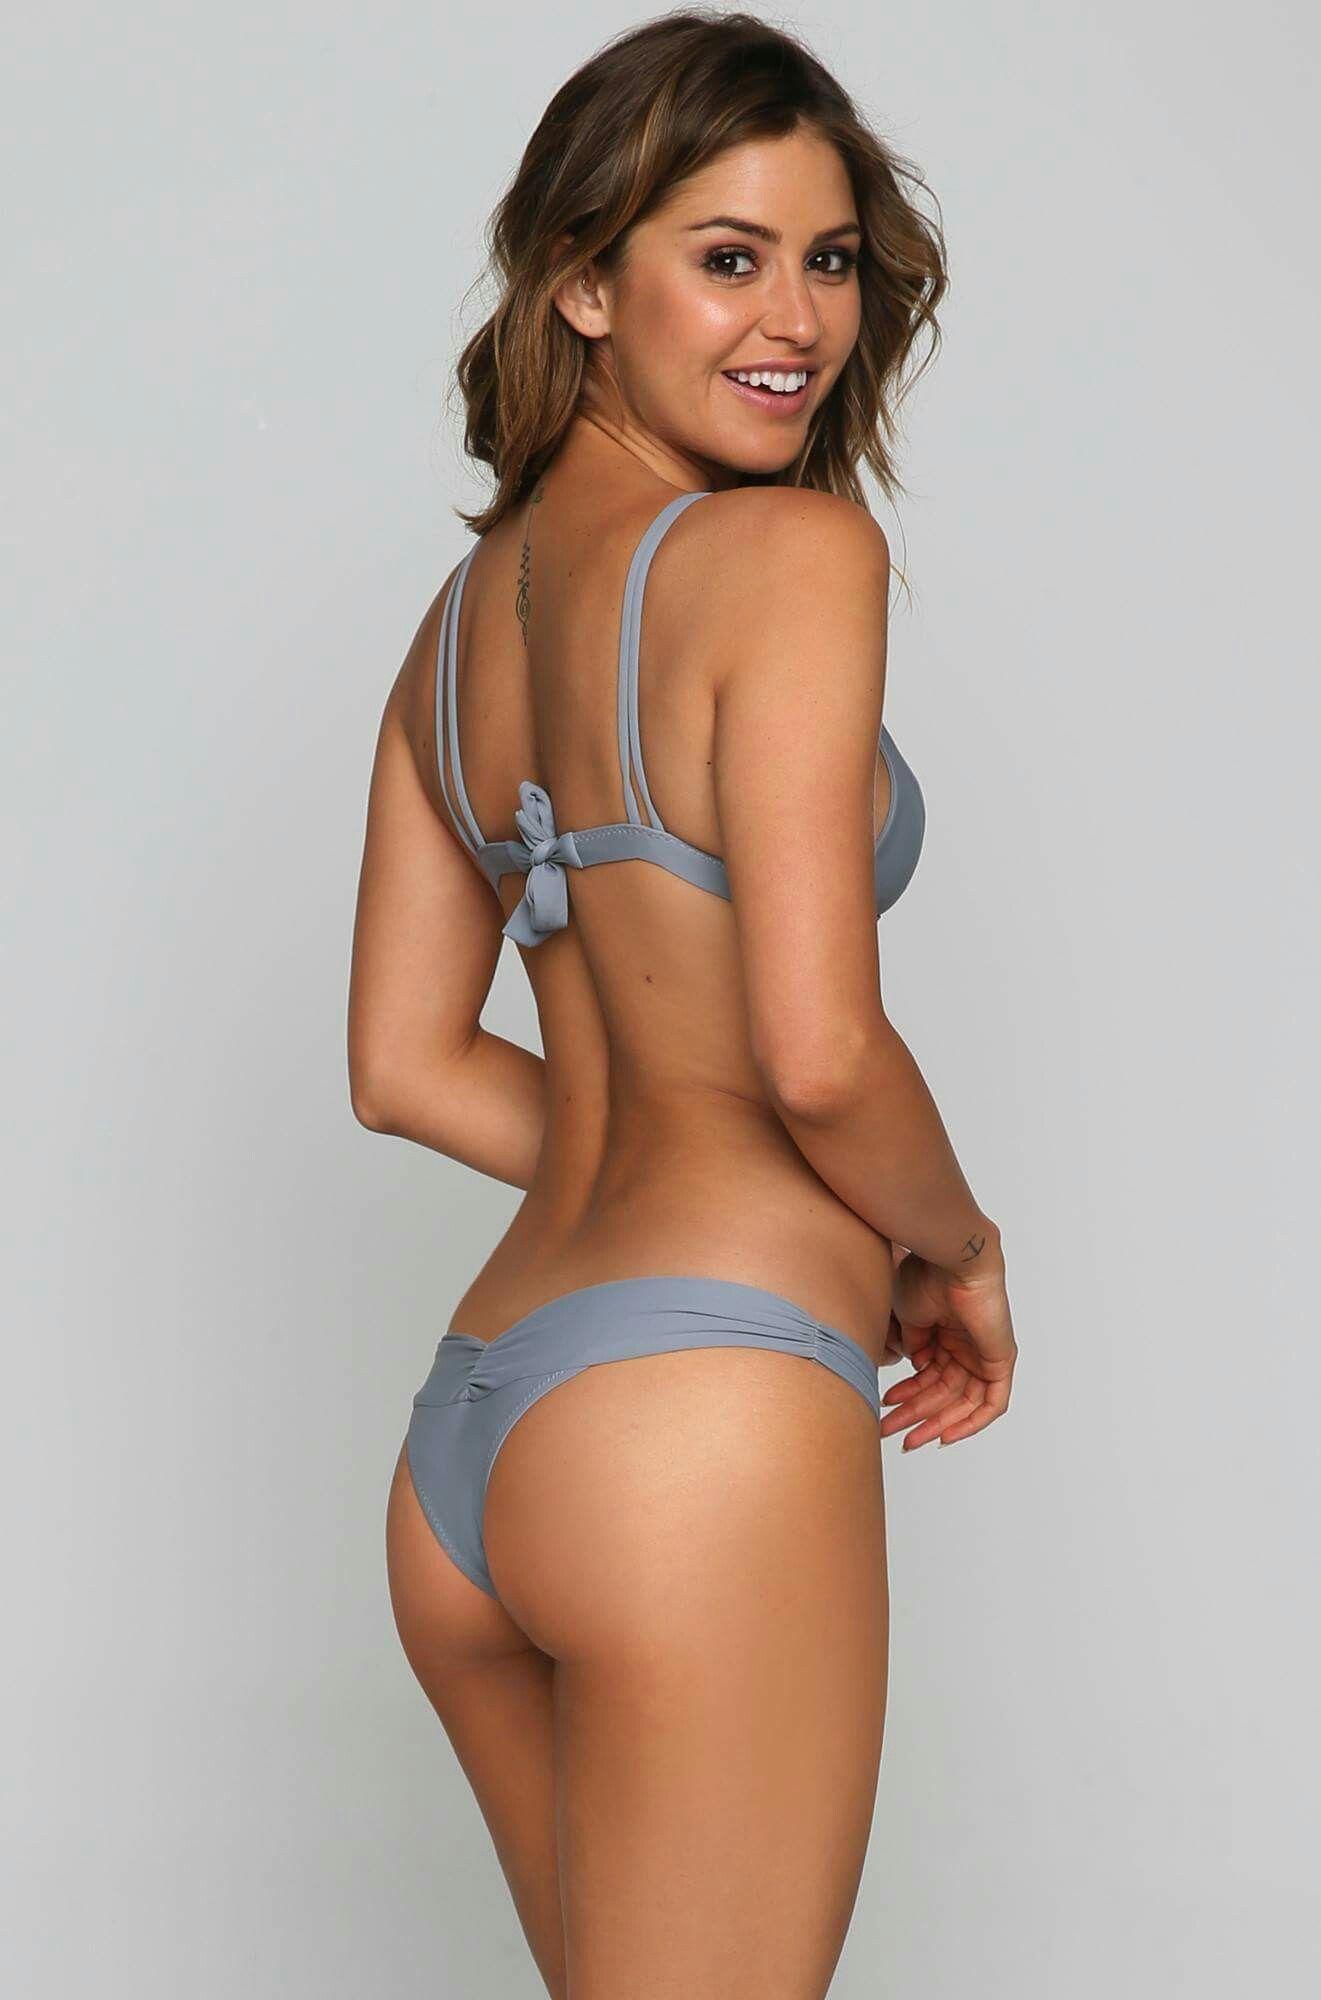 Jehane Gigi Paris   Beautiful Girls 2   Pinterest   Stylish and Girls